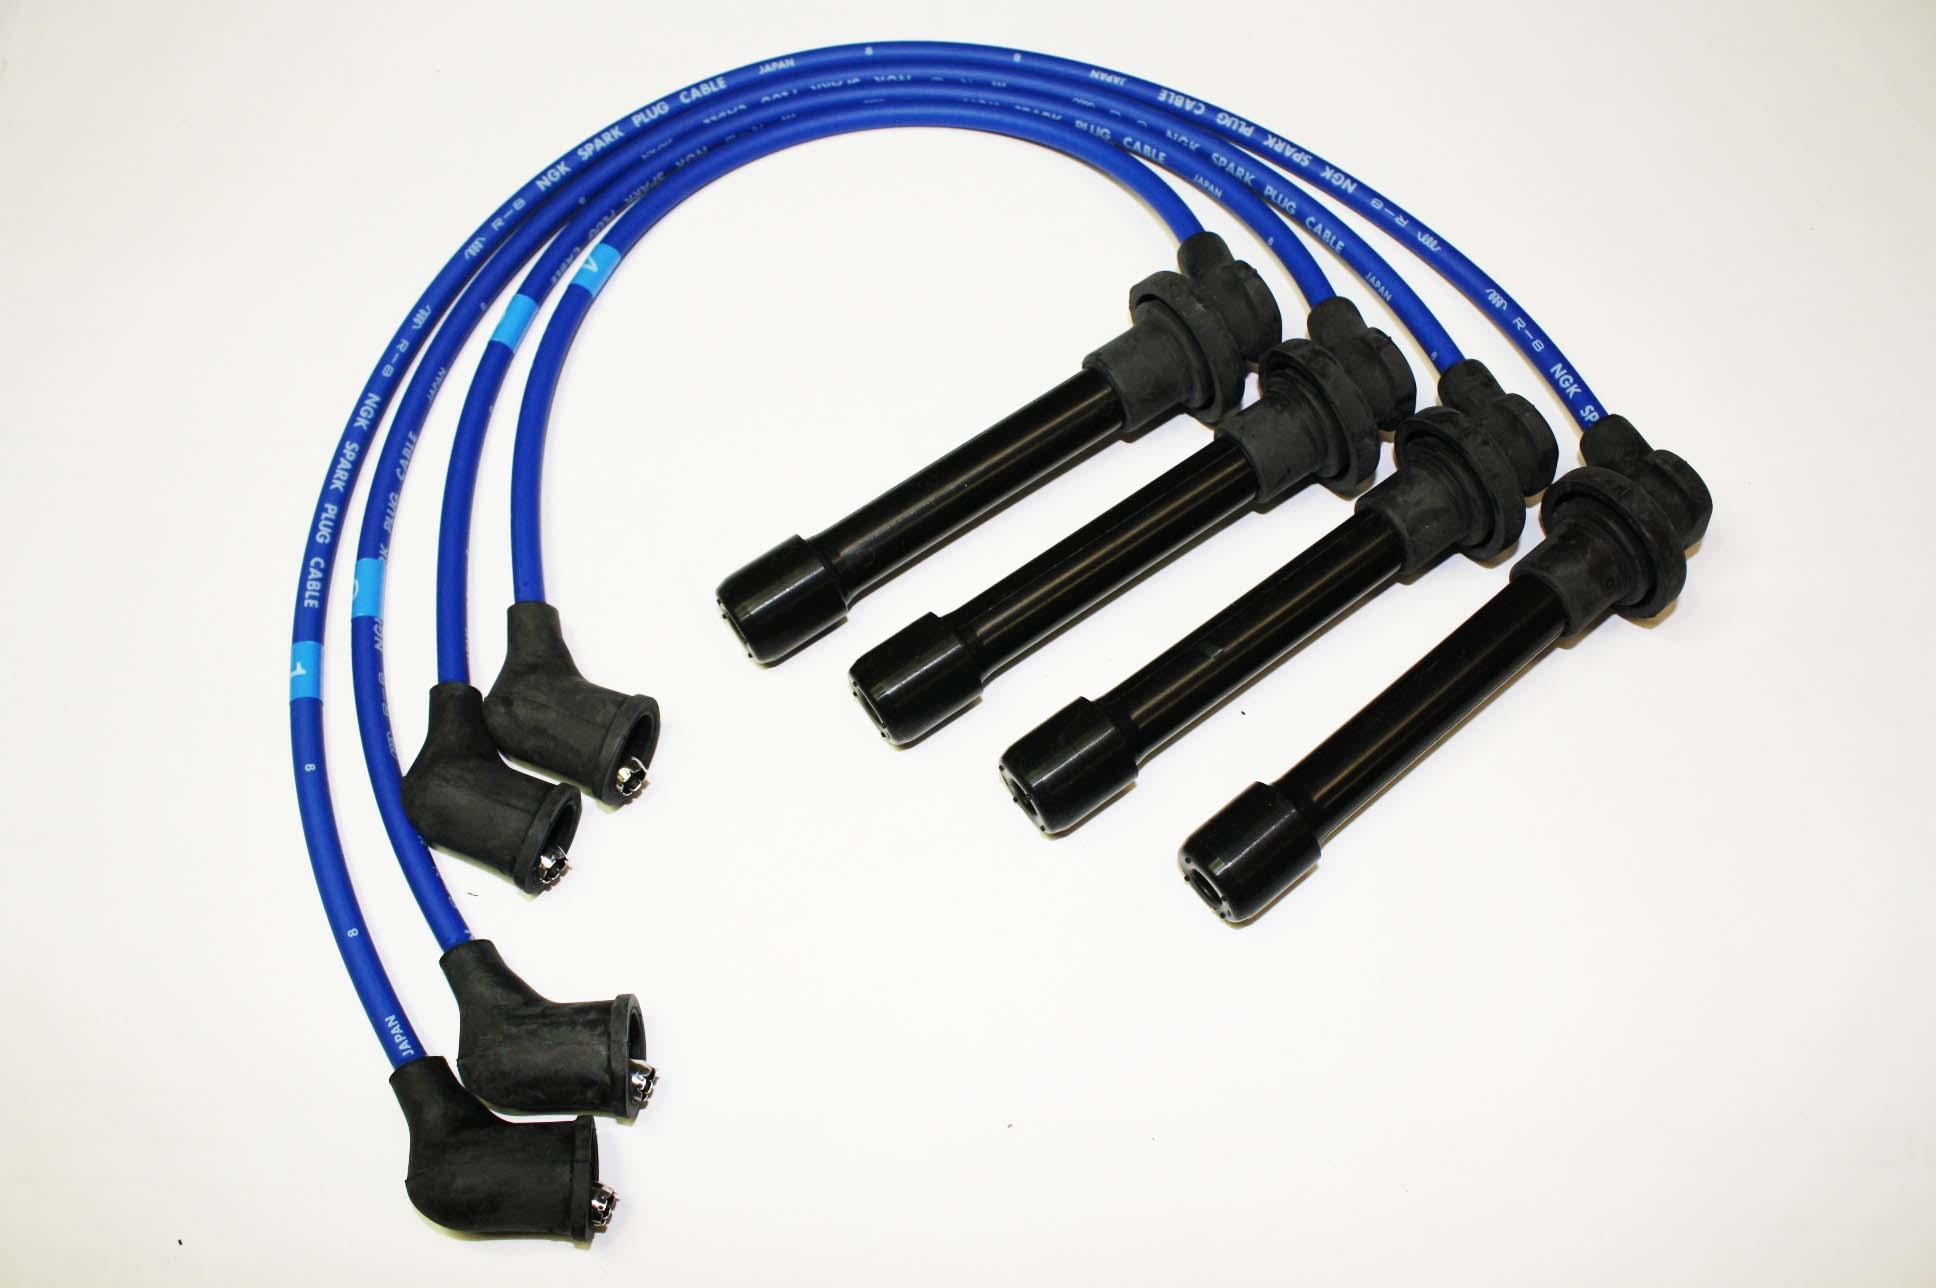 New Spark Plug Wire for Acura Integra 1994-2002